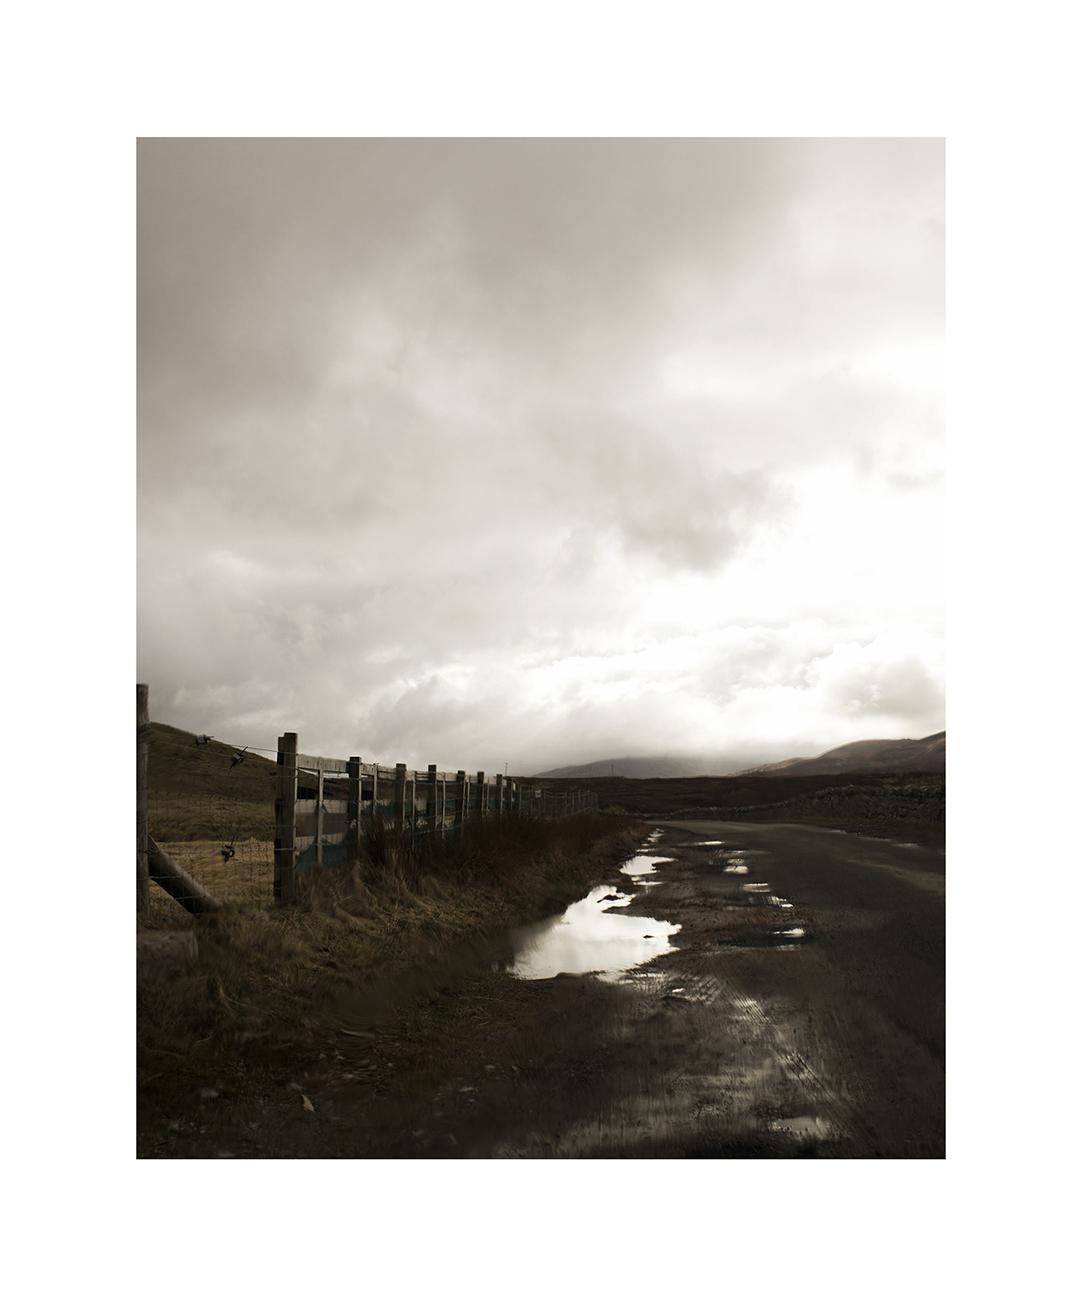 landscapev_03.jpg